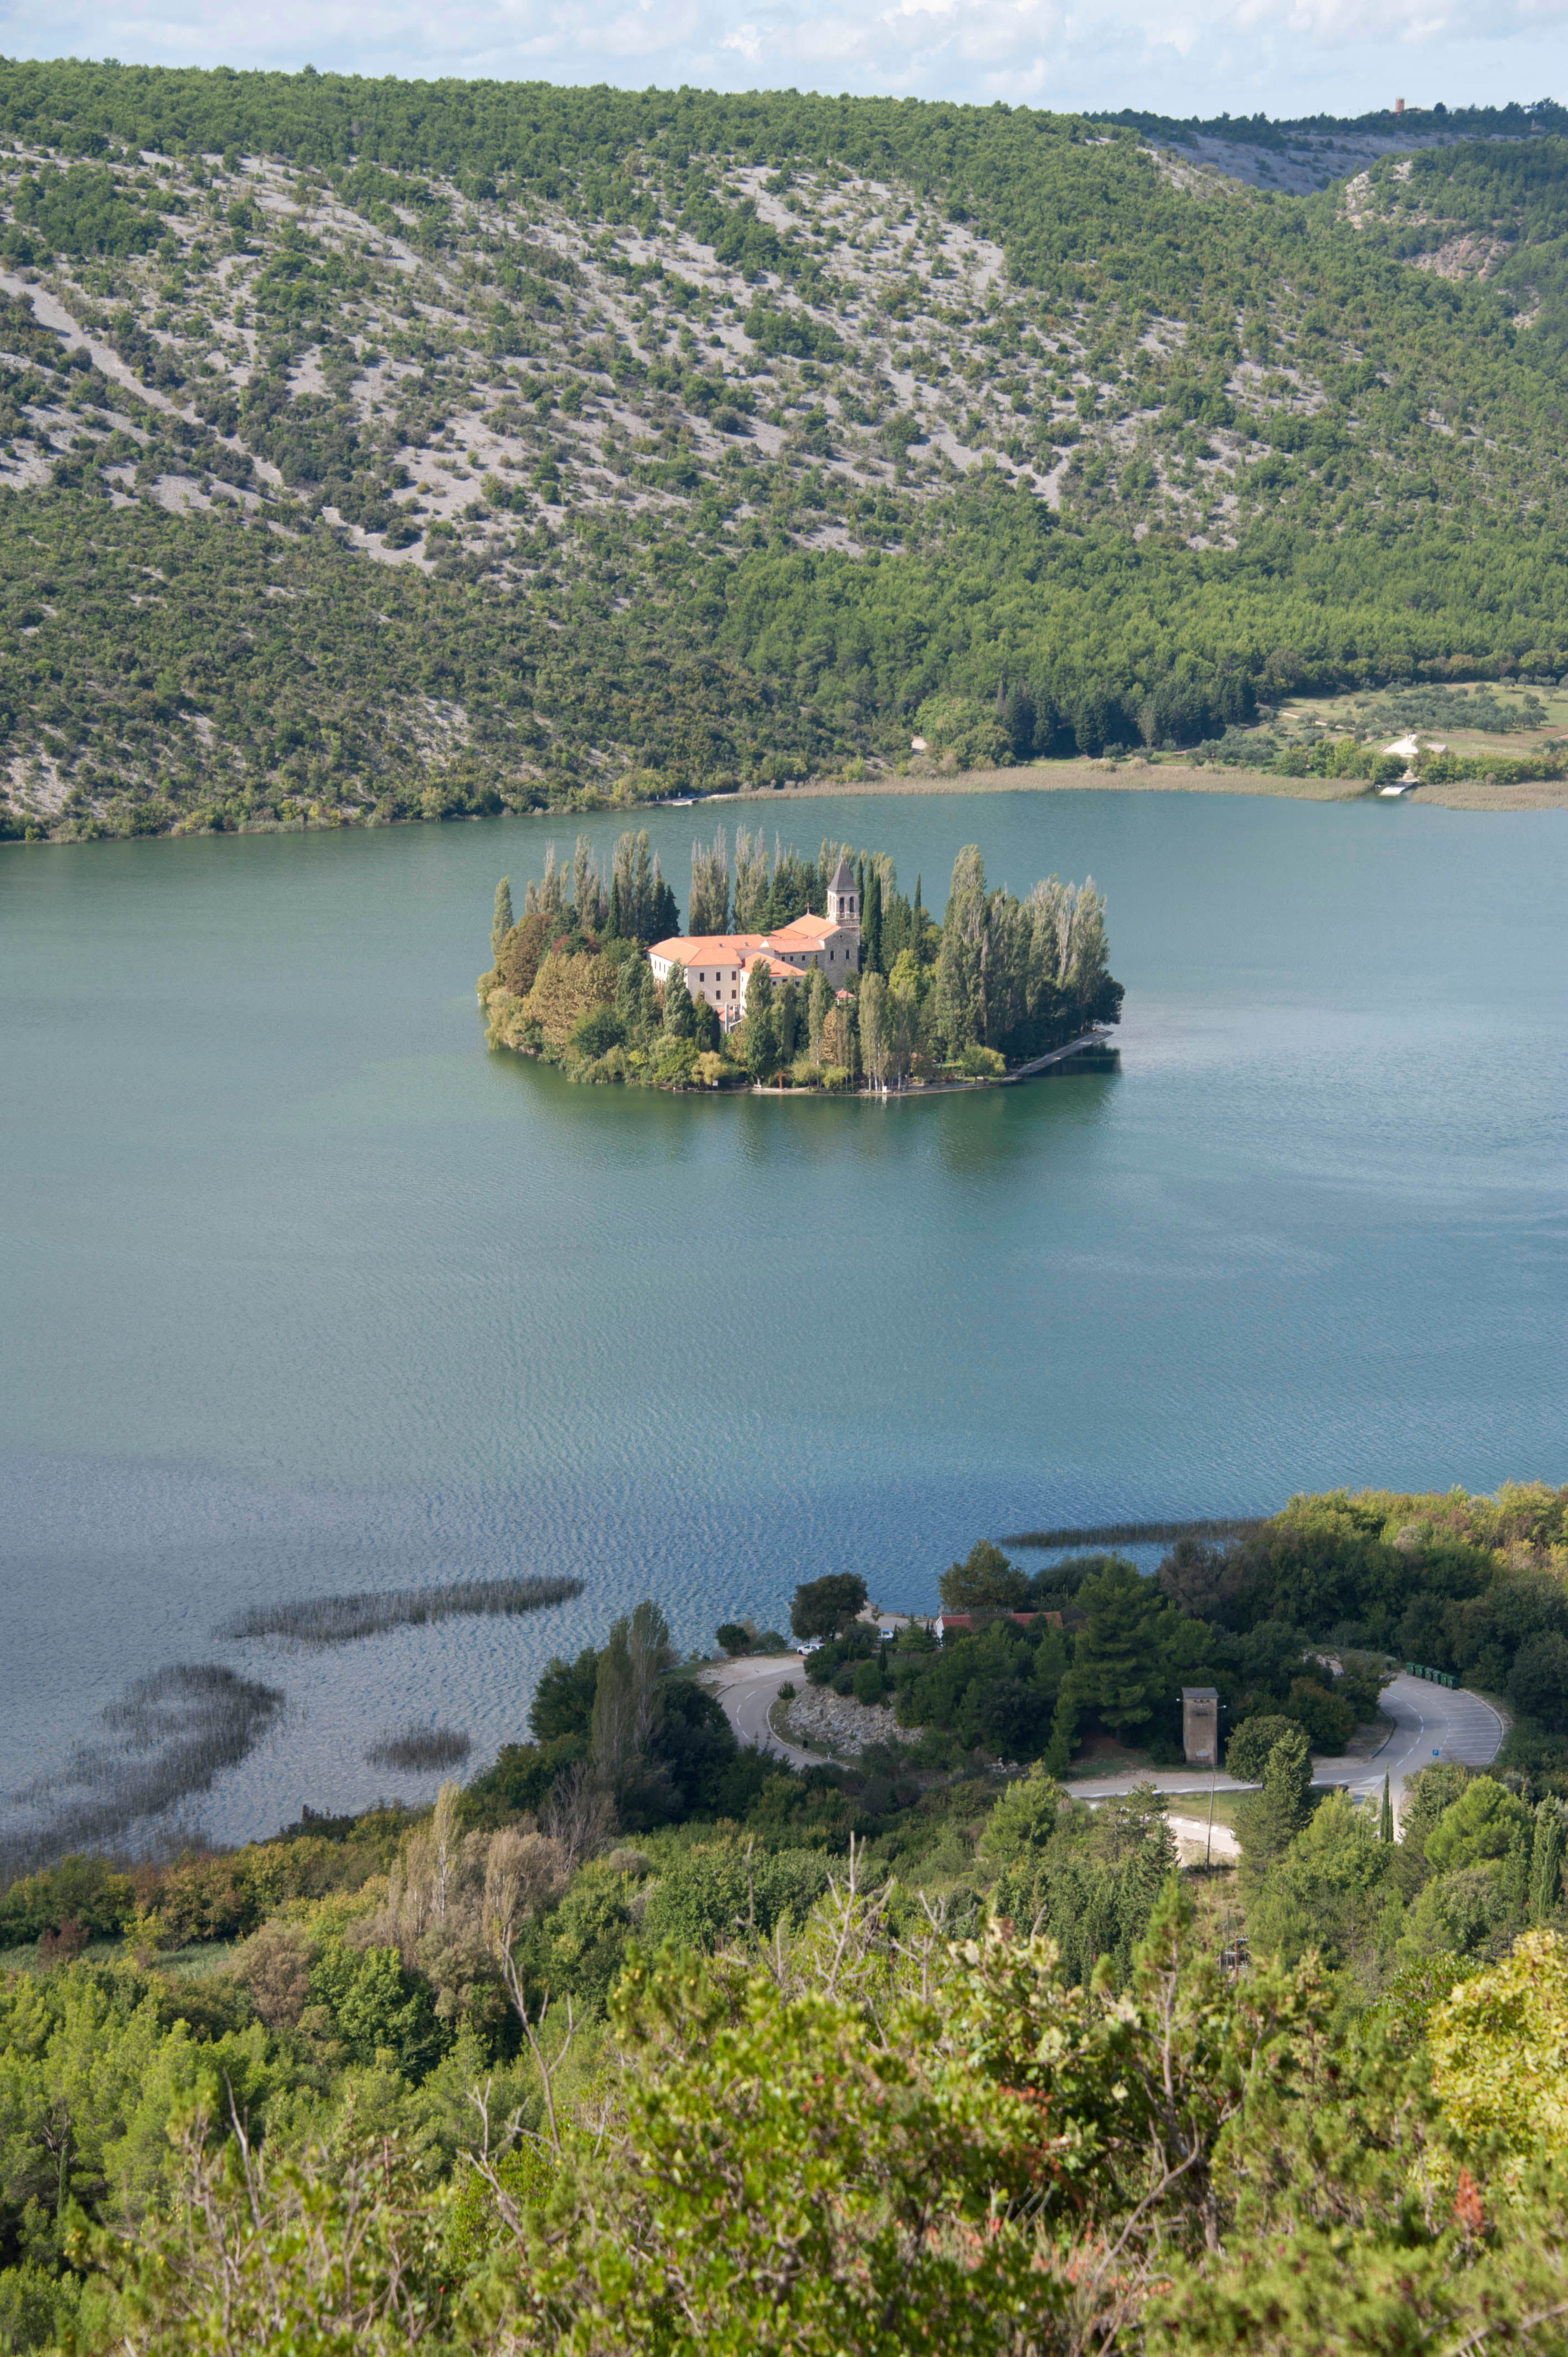 9473-Parc national Krka (Dalmatie du Nord)